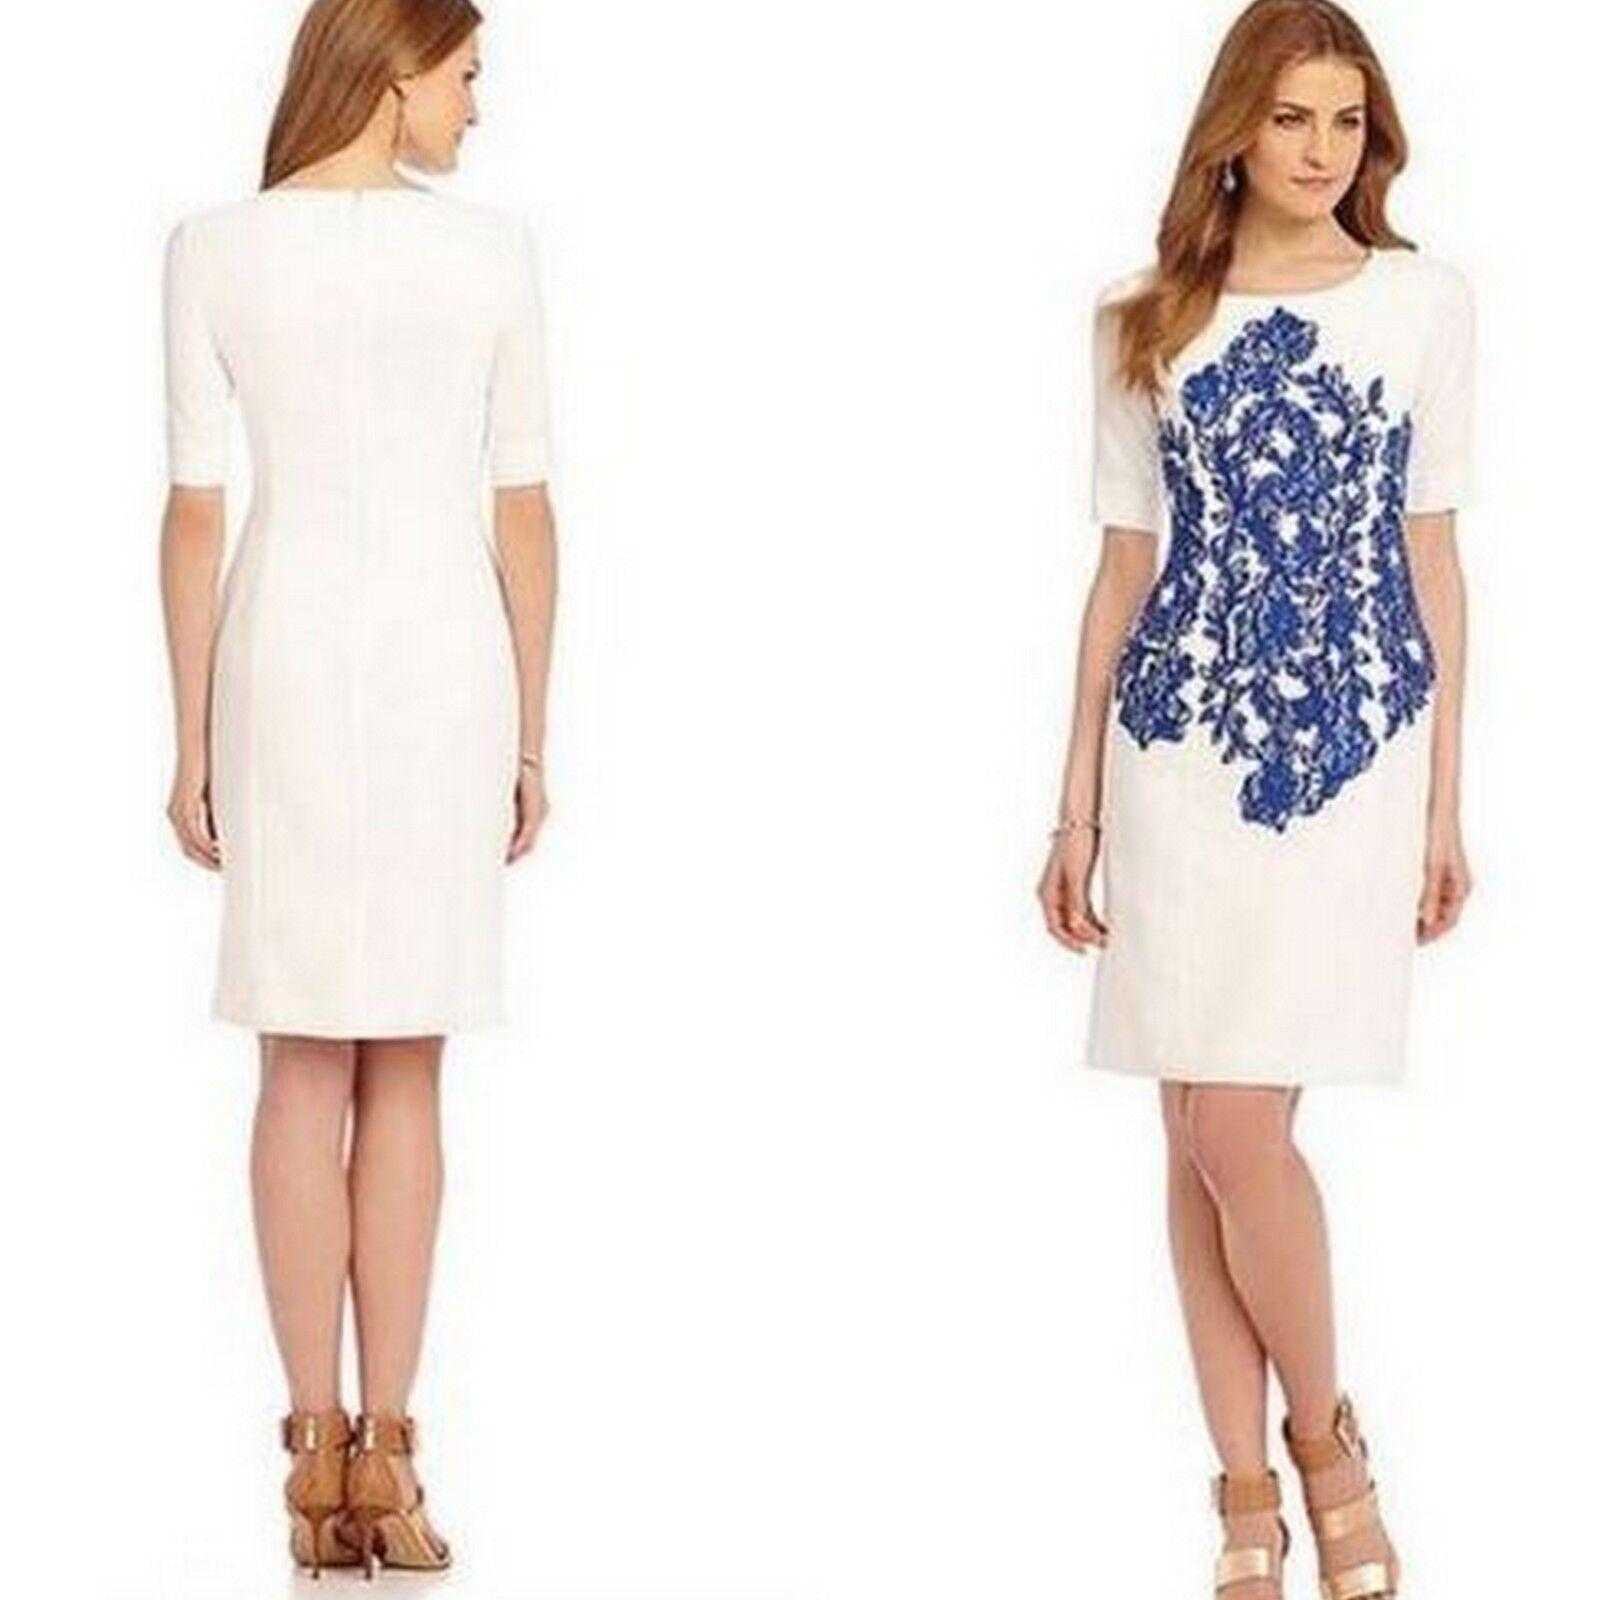 Katherine Kelly Ivory Cobalt bluee Lace-Embroidered Sheath Dress 10, 12